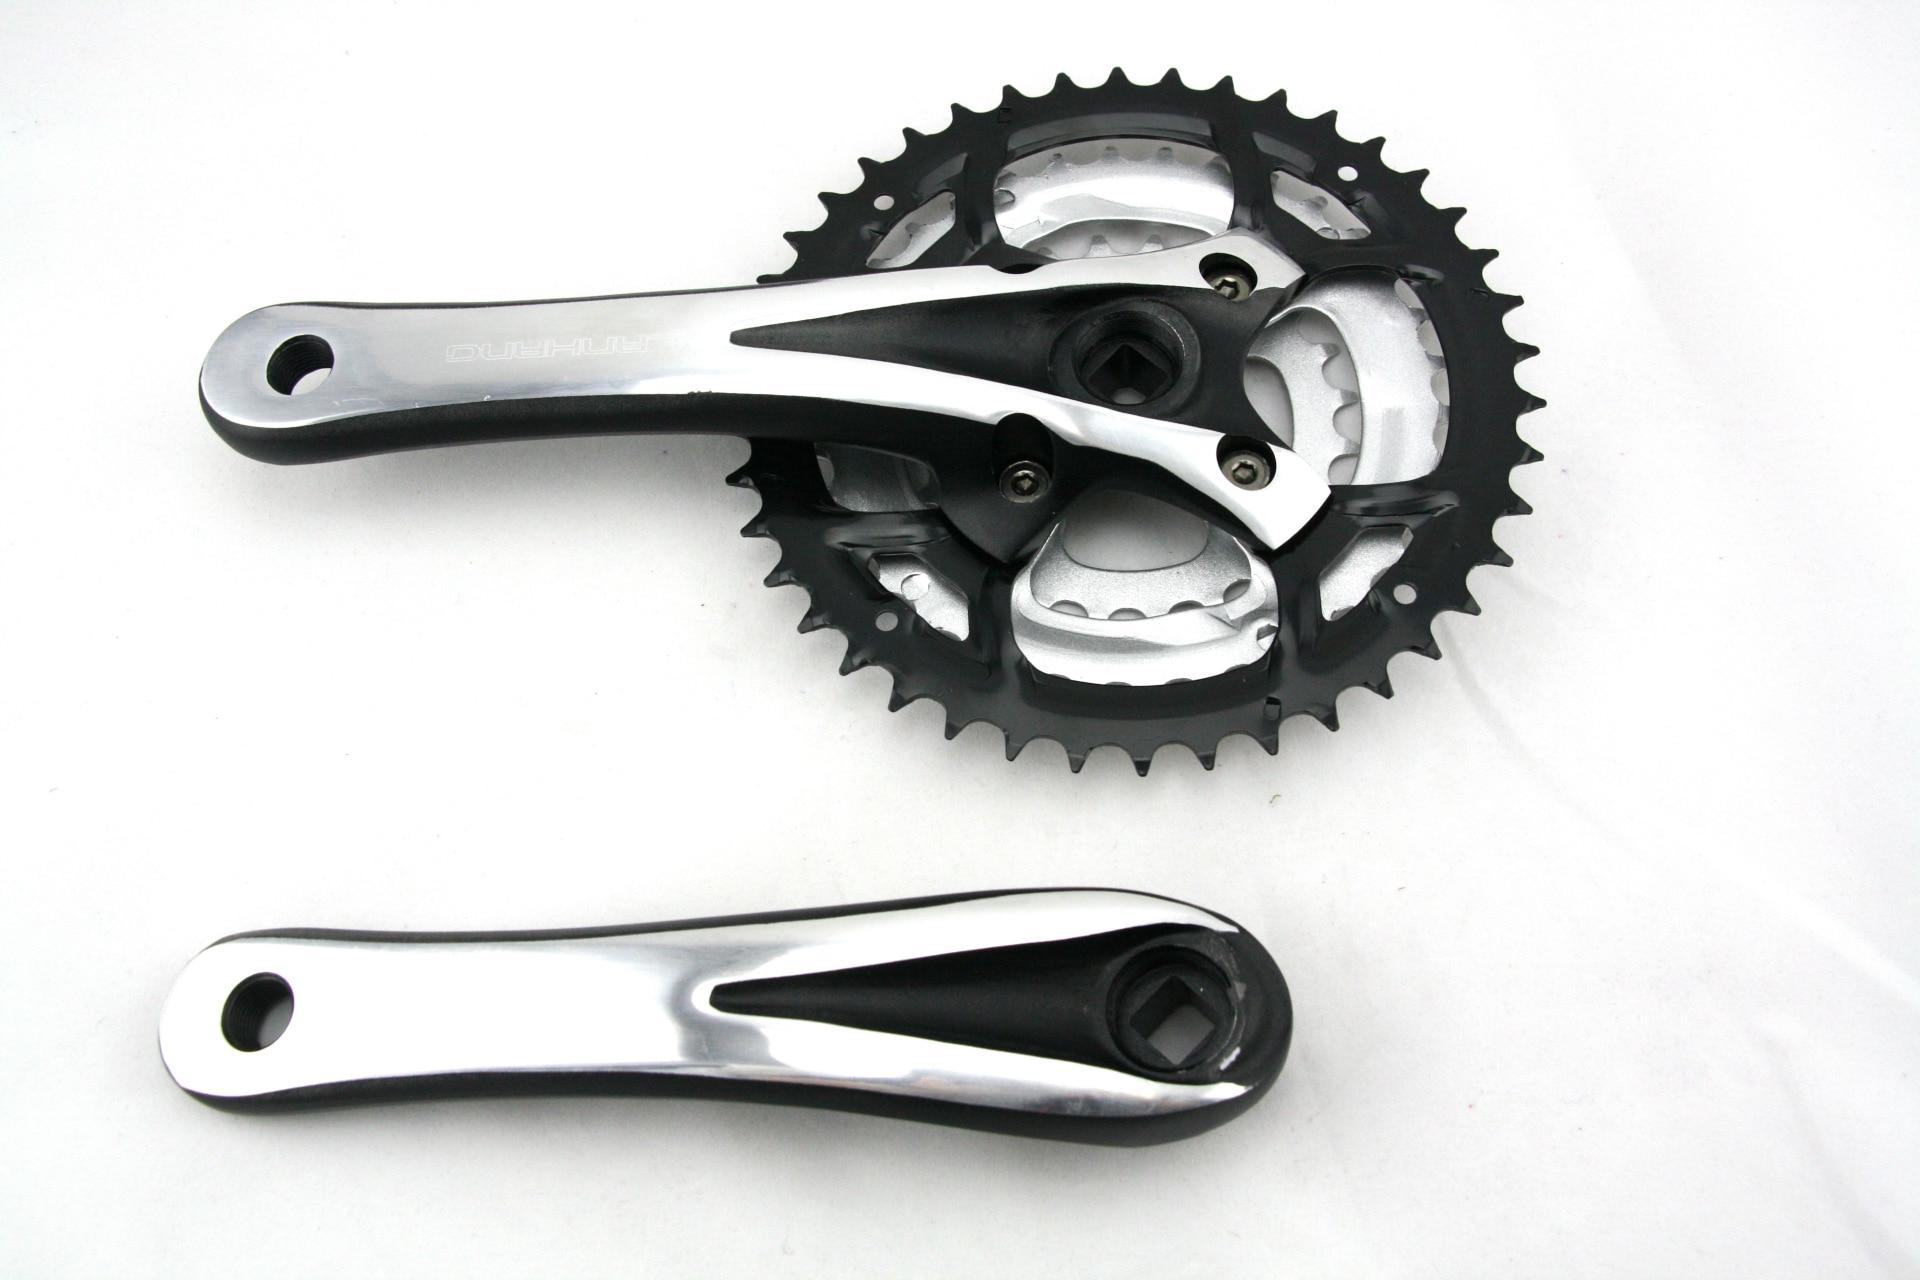 Bicycle Crank Arm Left Right Crankset MTB Road Bike 170mm 130BCD Square Taper